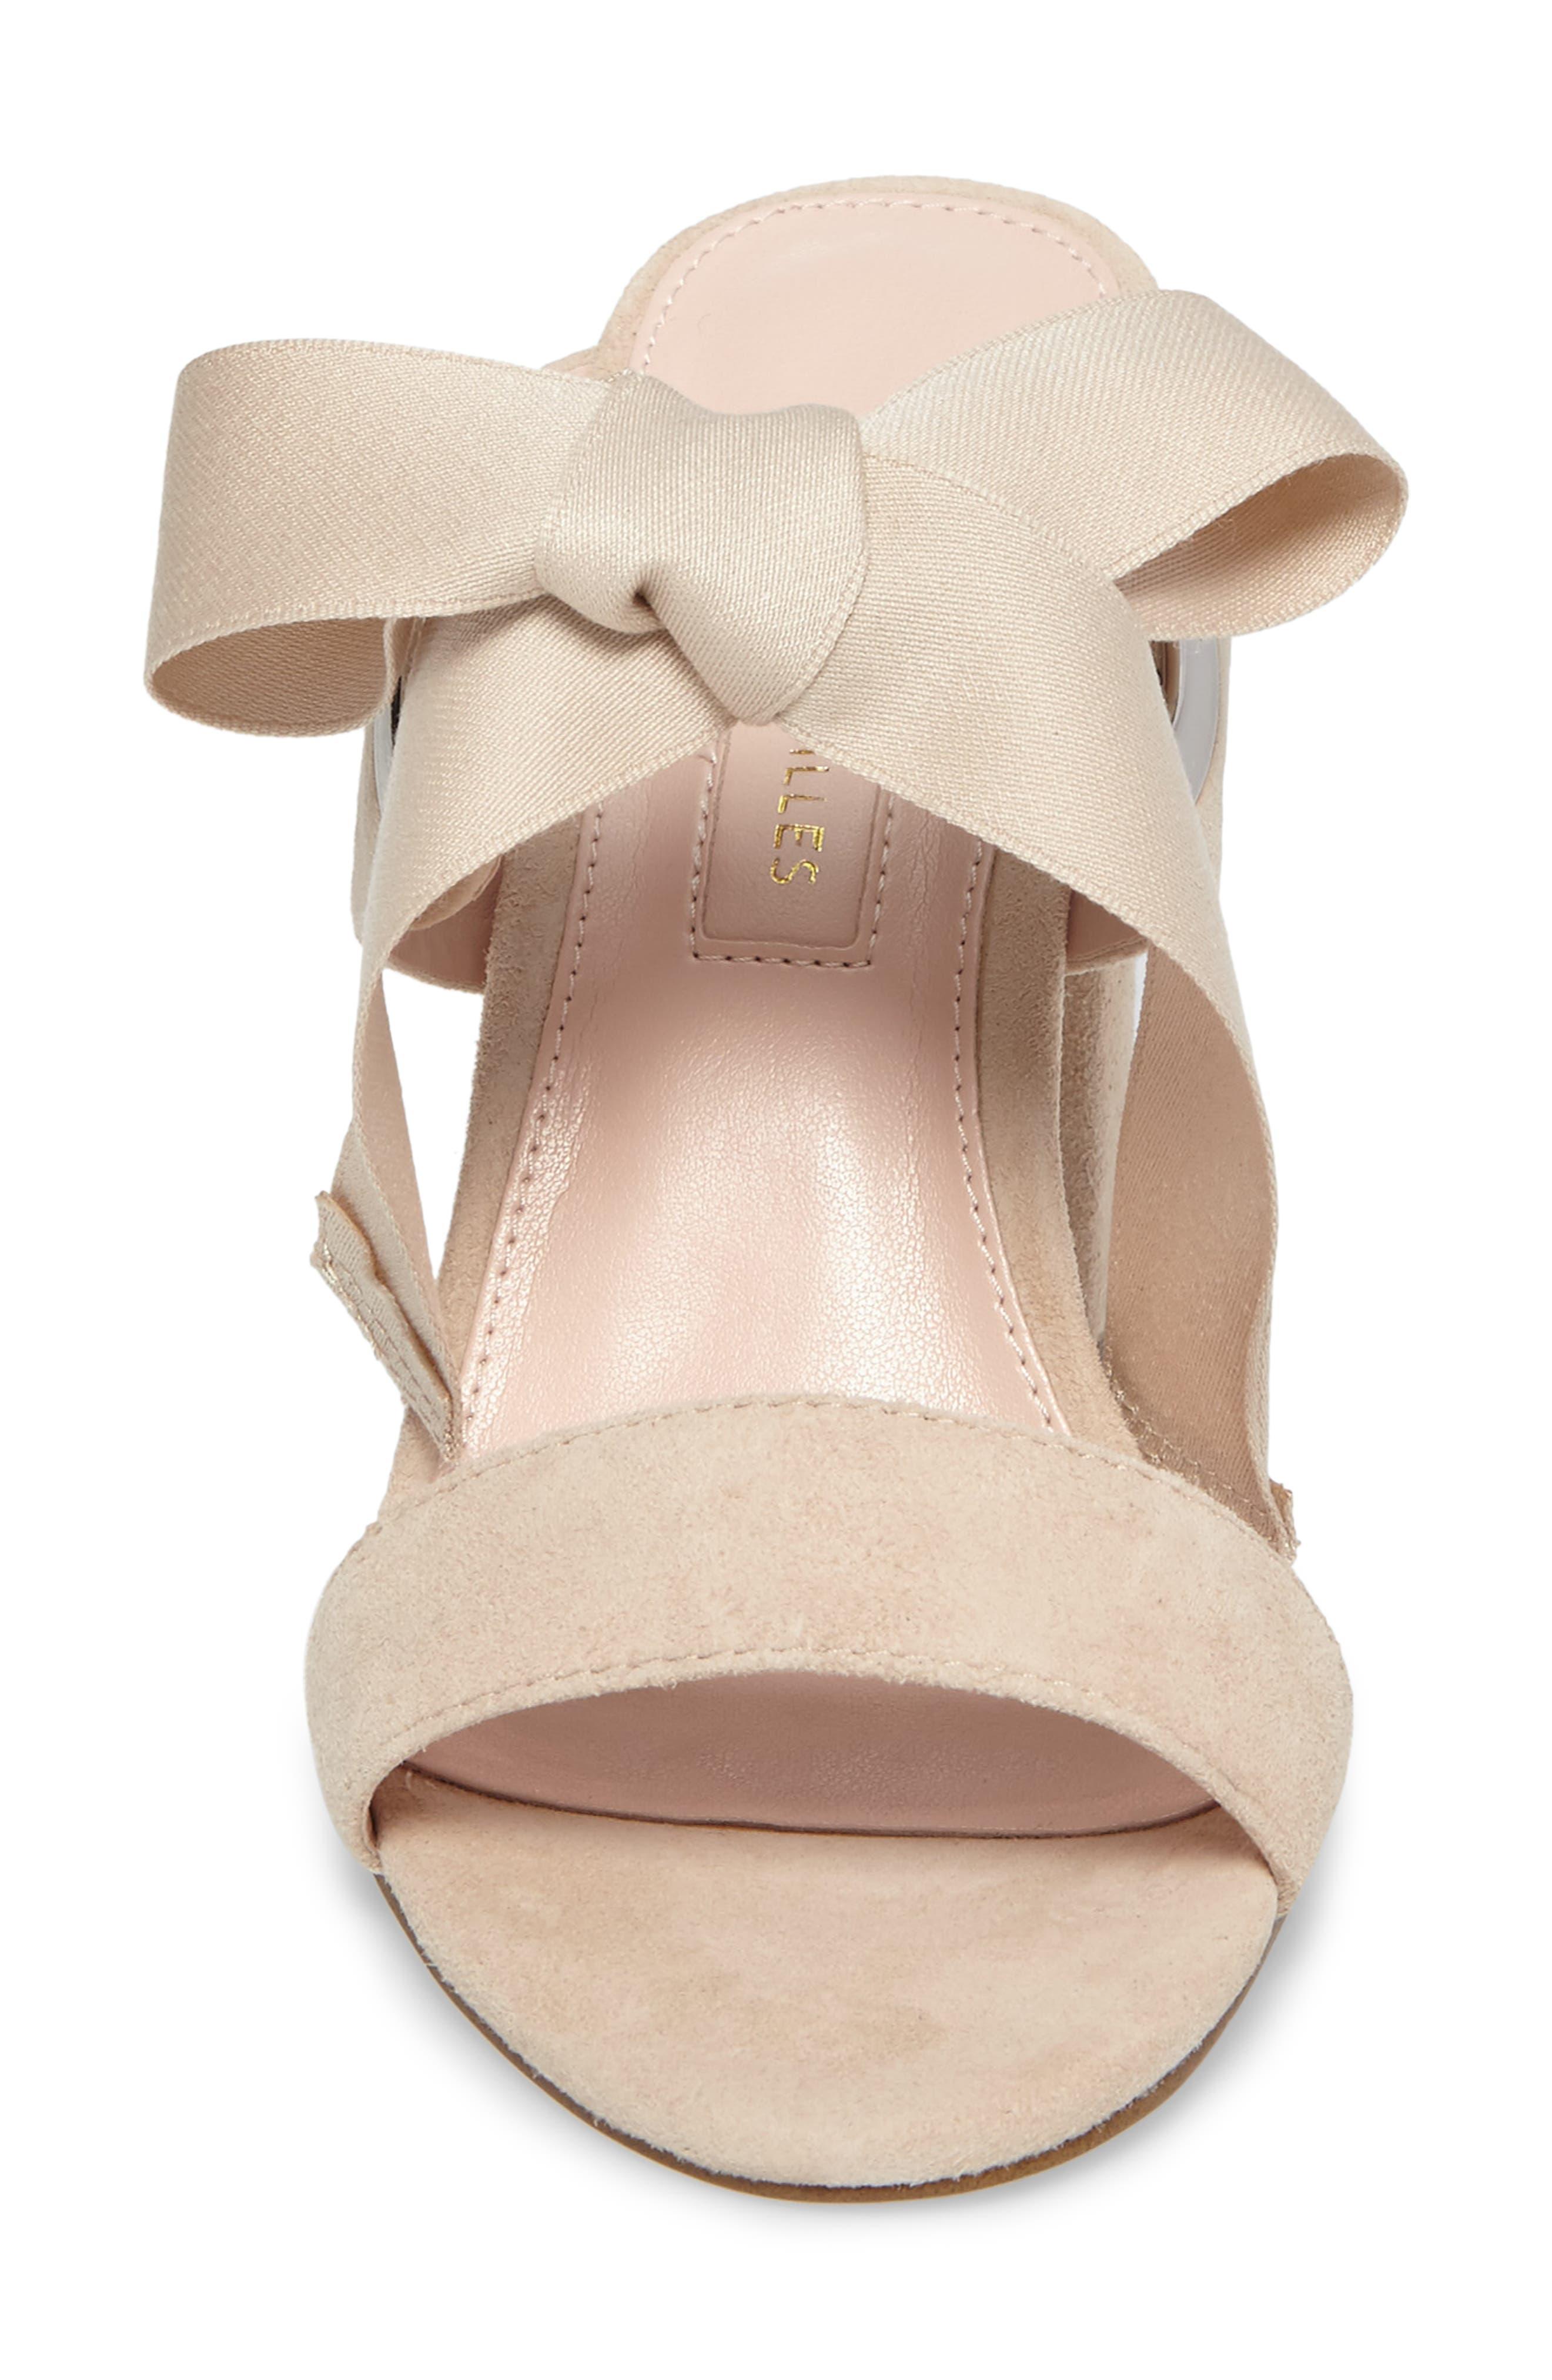 Megan Tie Strap Sandal,                             Alternate thumbnail 8, color,